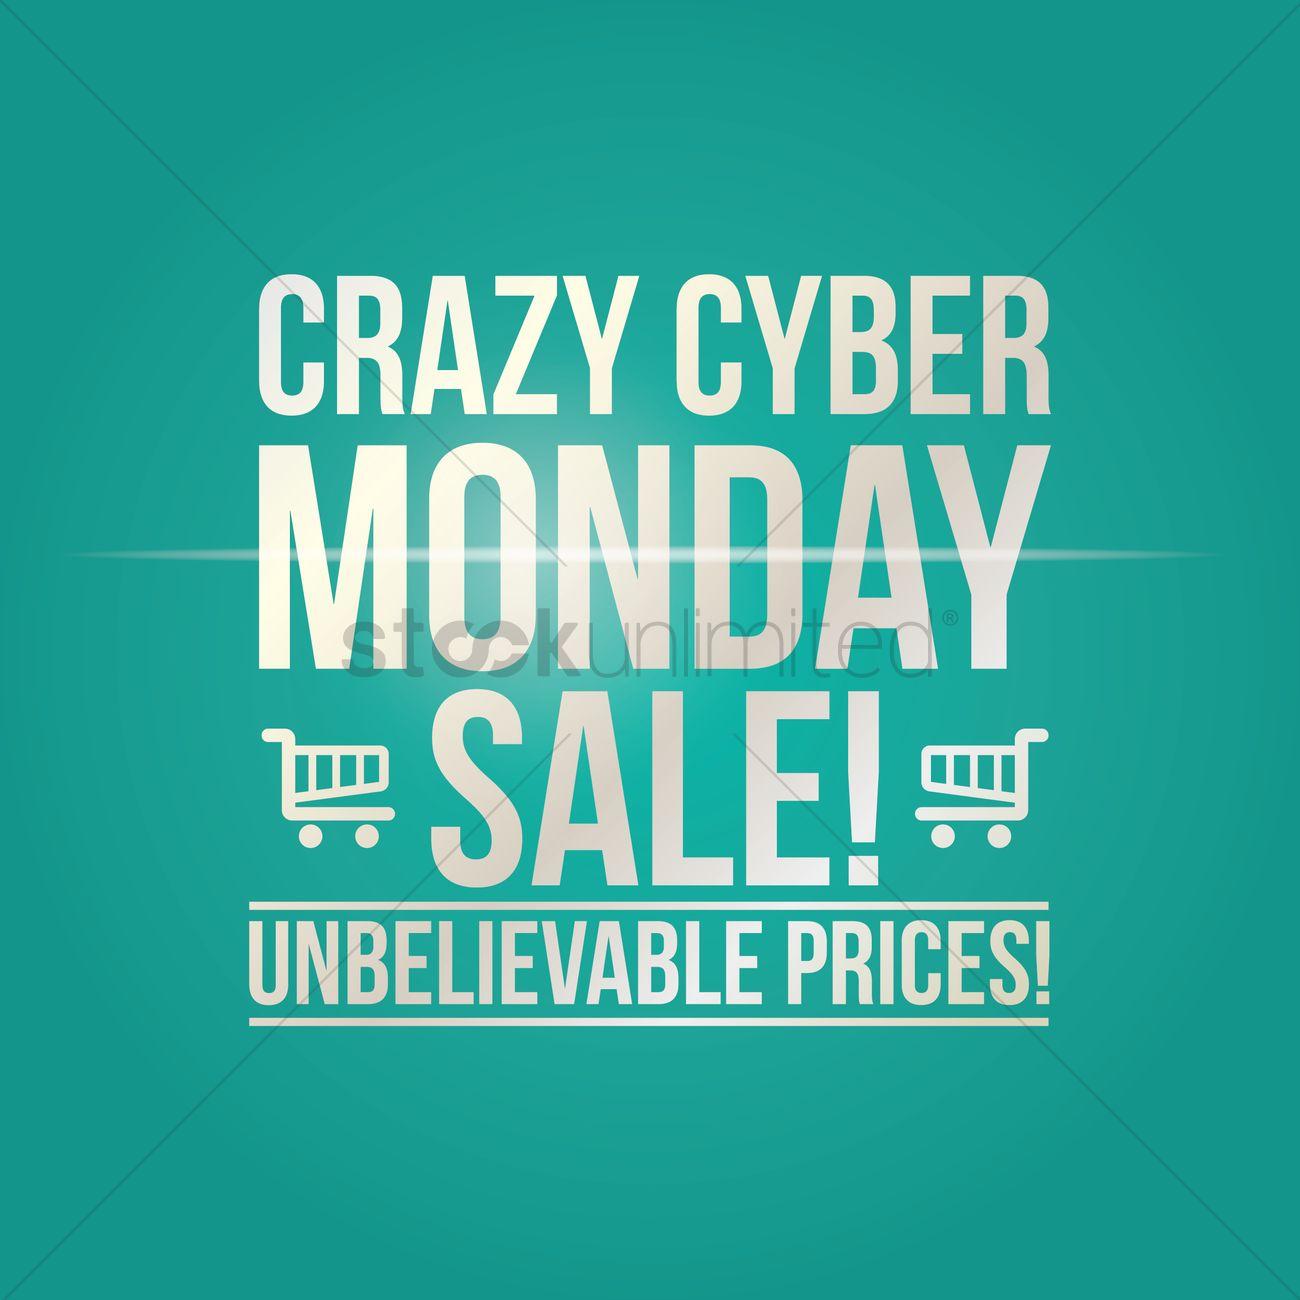 3b75e8d40f9 Cyber monday sale wallpaper Vector Image - 1613172 | StockUnlimited